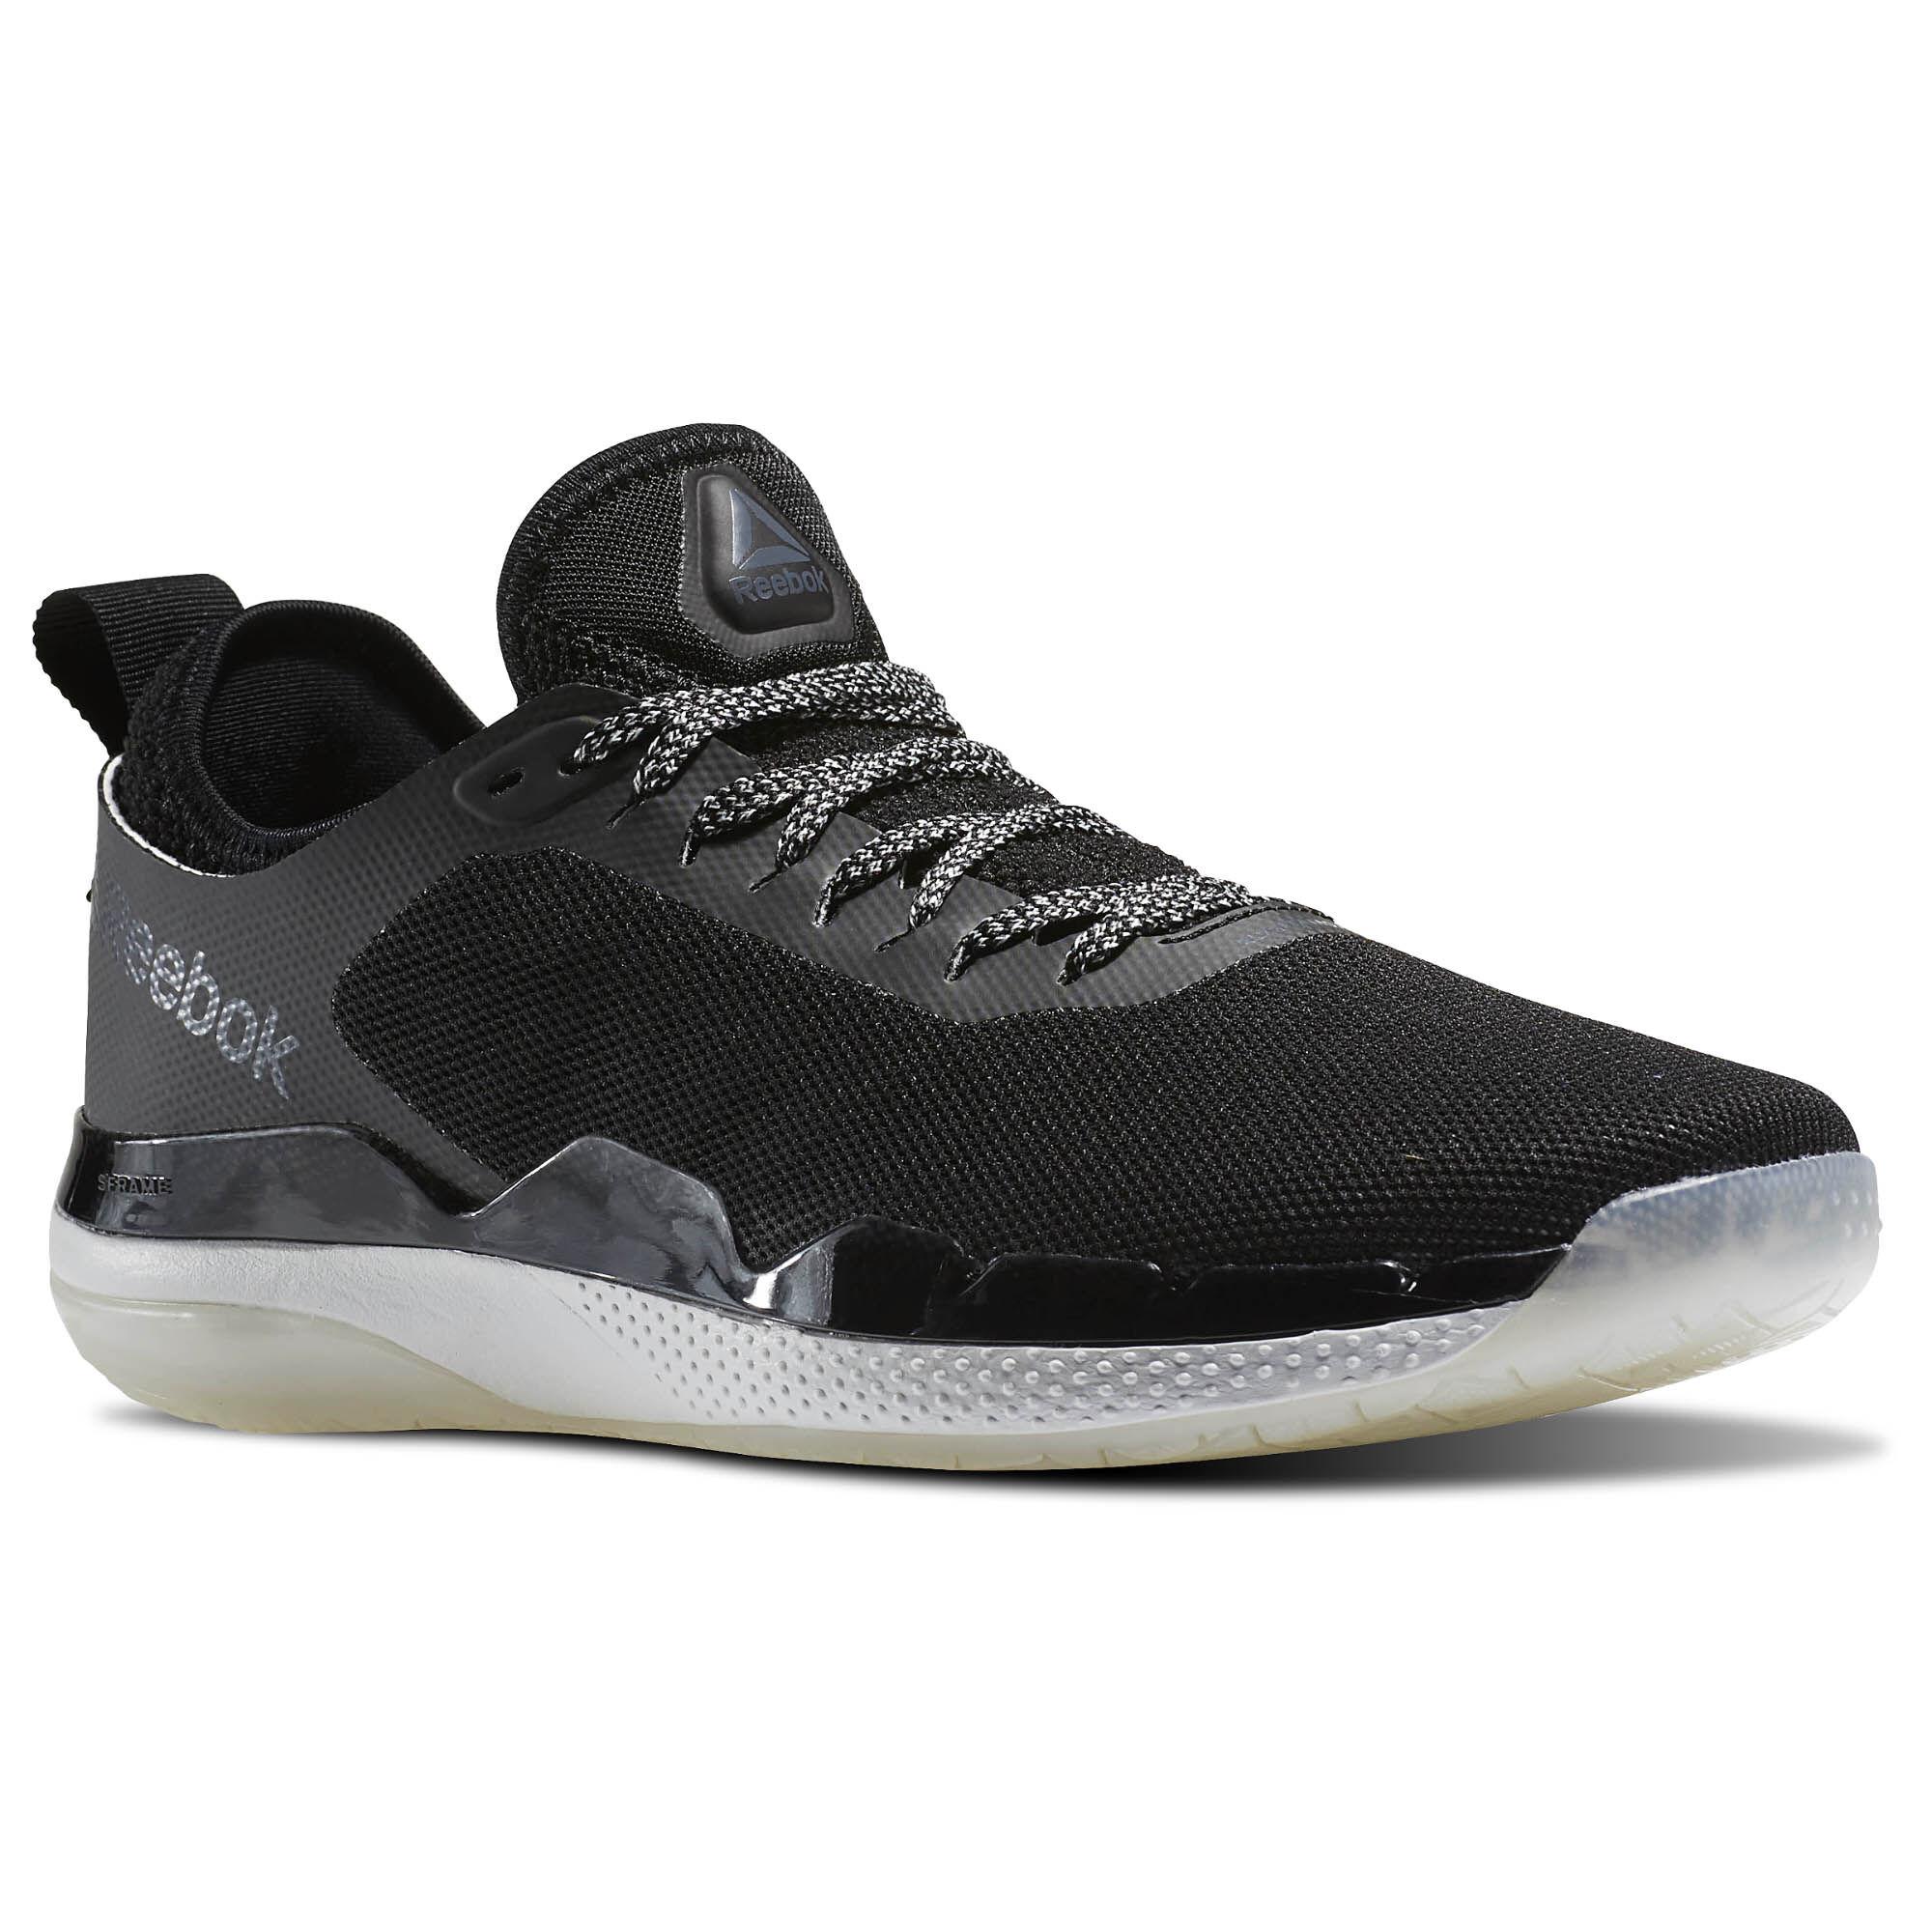 reebok shoe sales, Reebok Les Mills Cardio Ultra 3.0